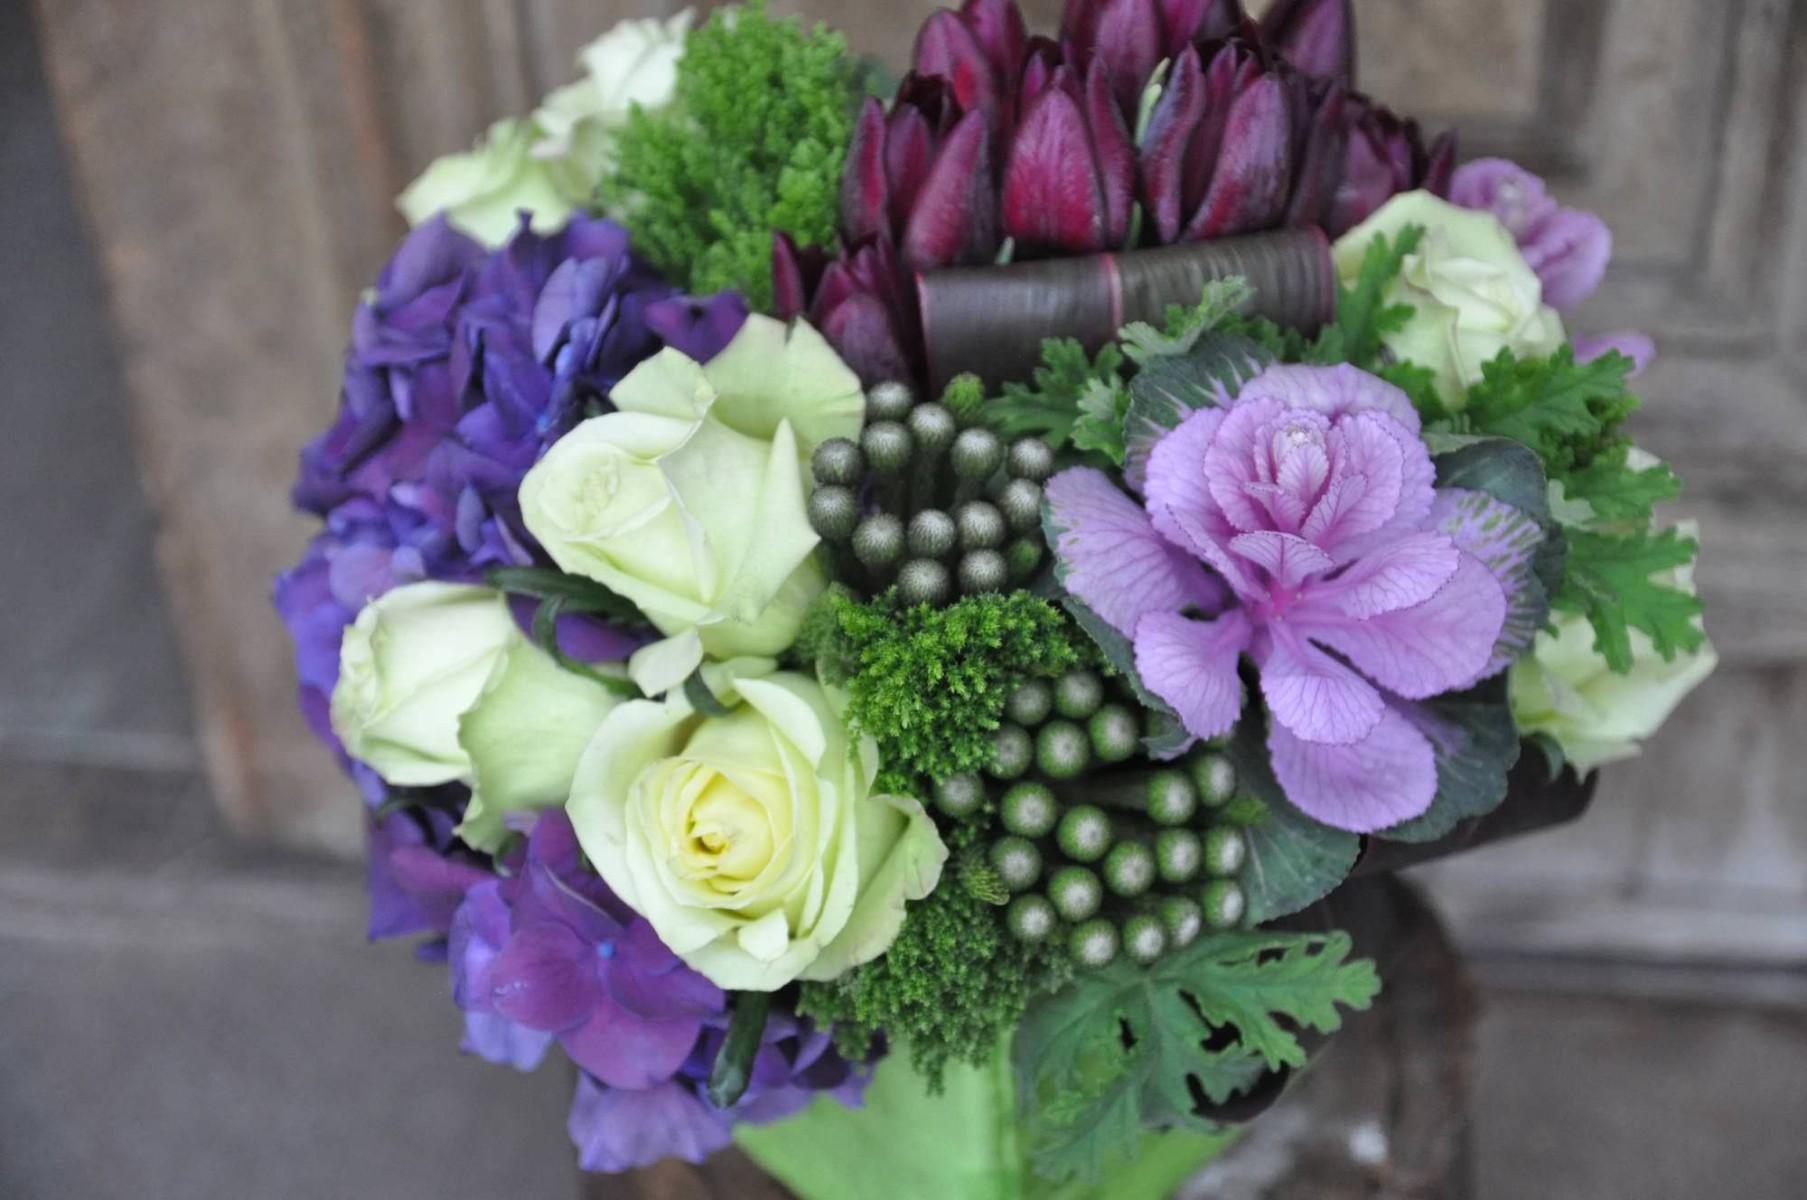 nisies-enchanted-florist-orange-county-floral-arrangments-4